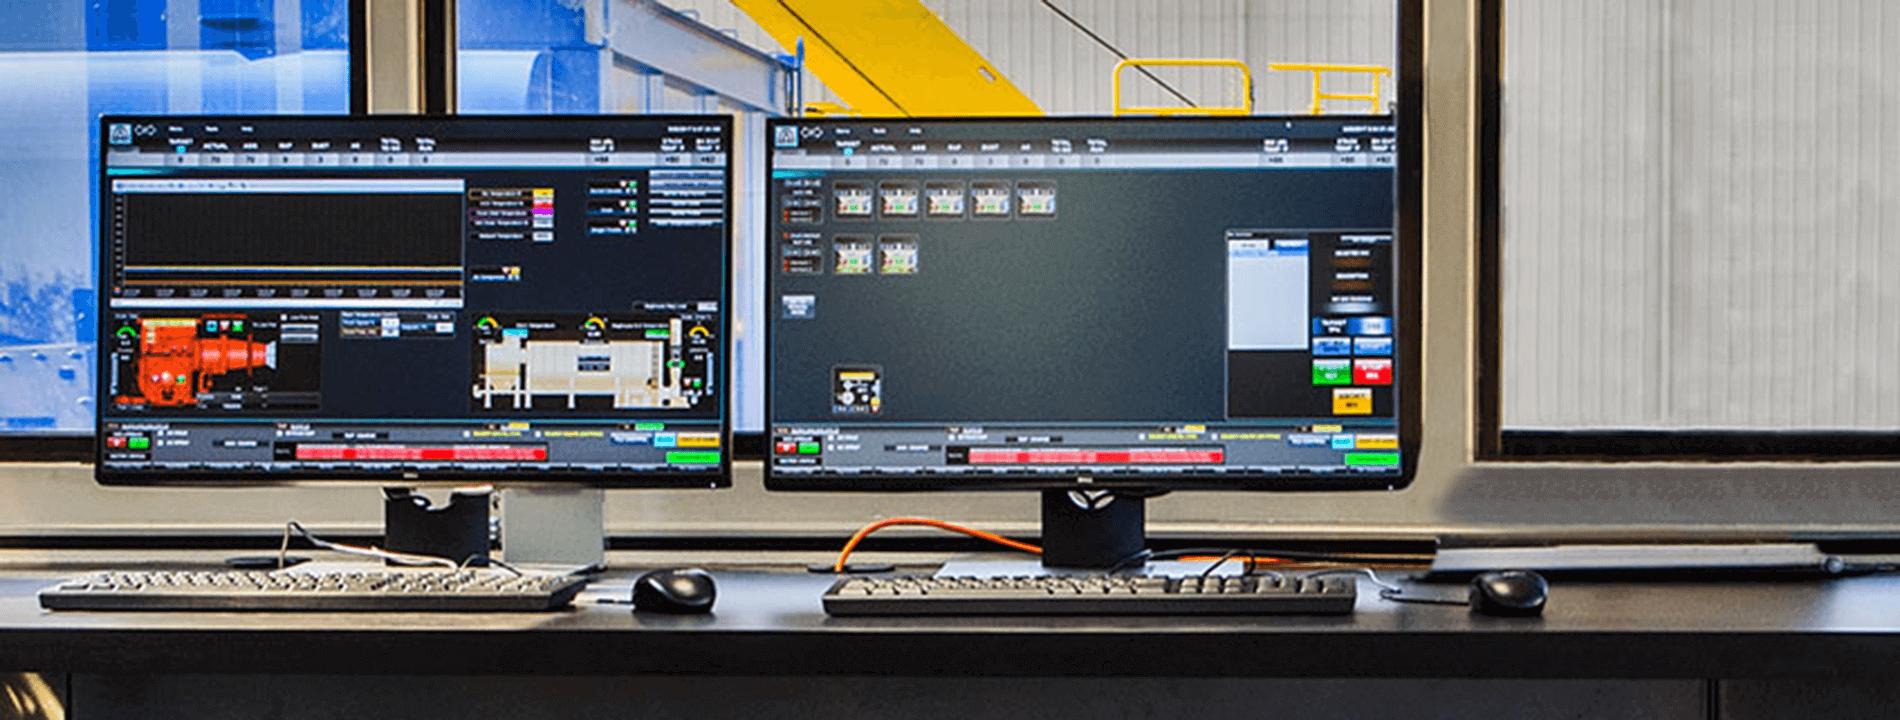 Astec PMIII asphalt plant controls